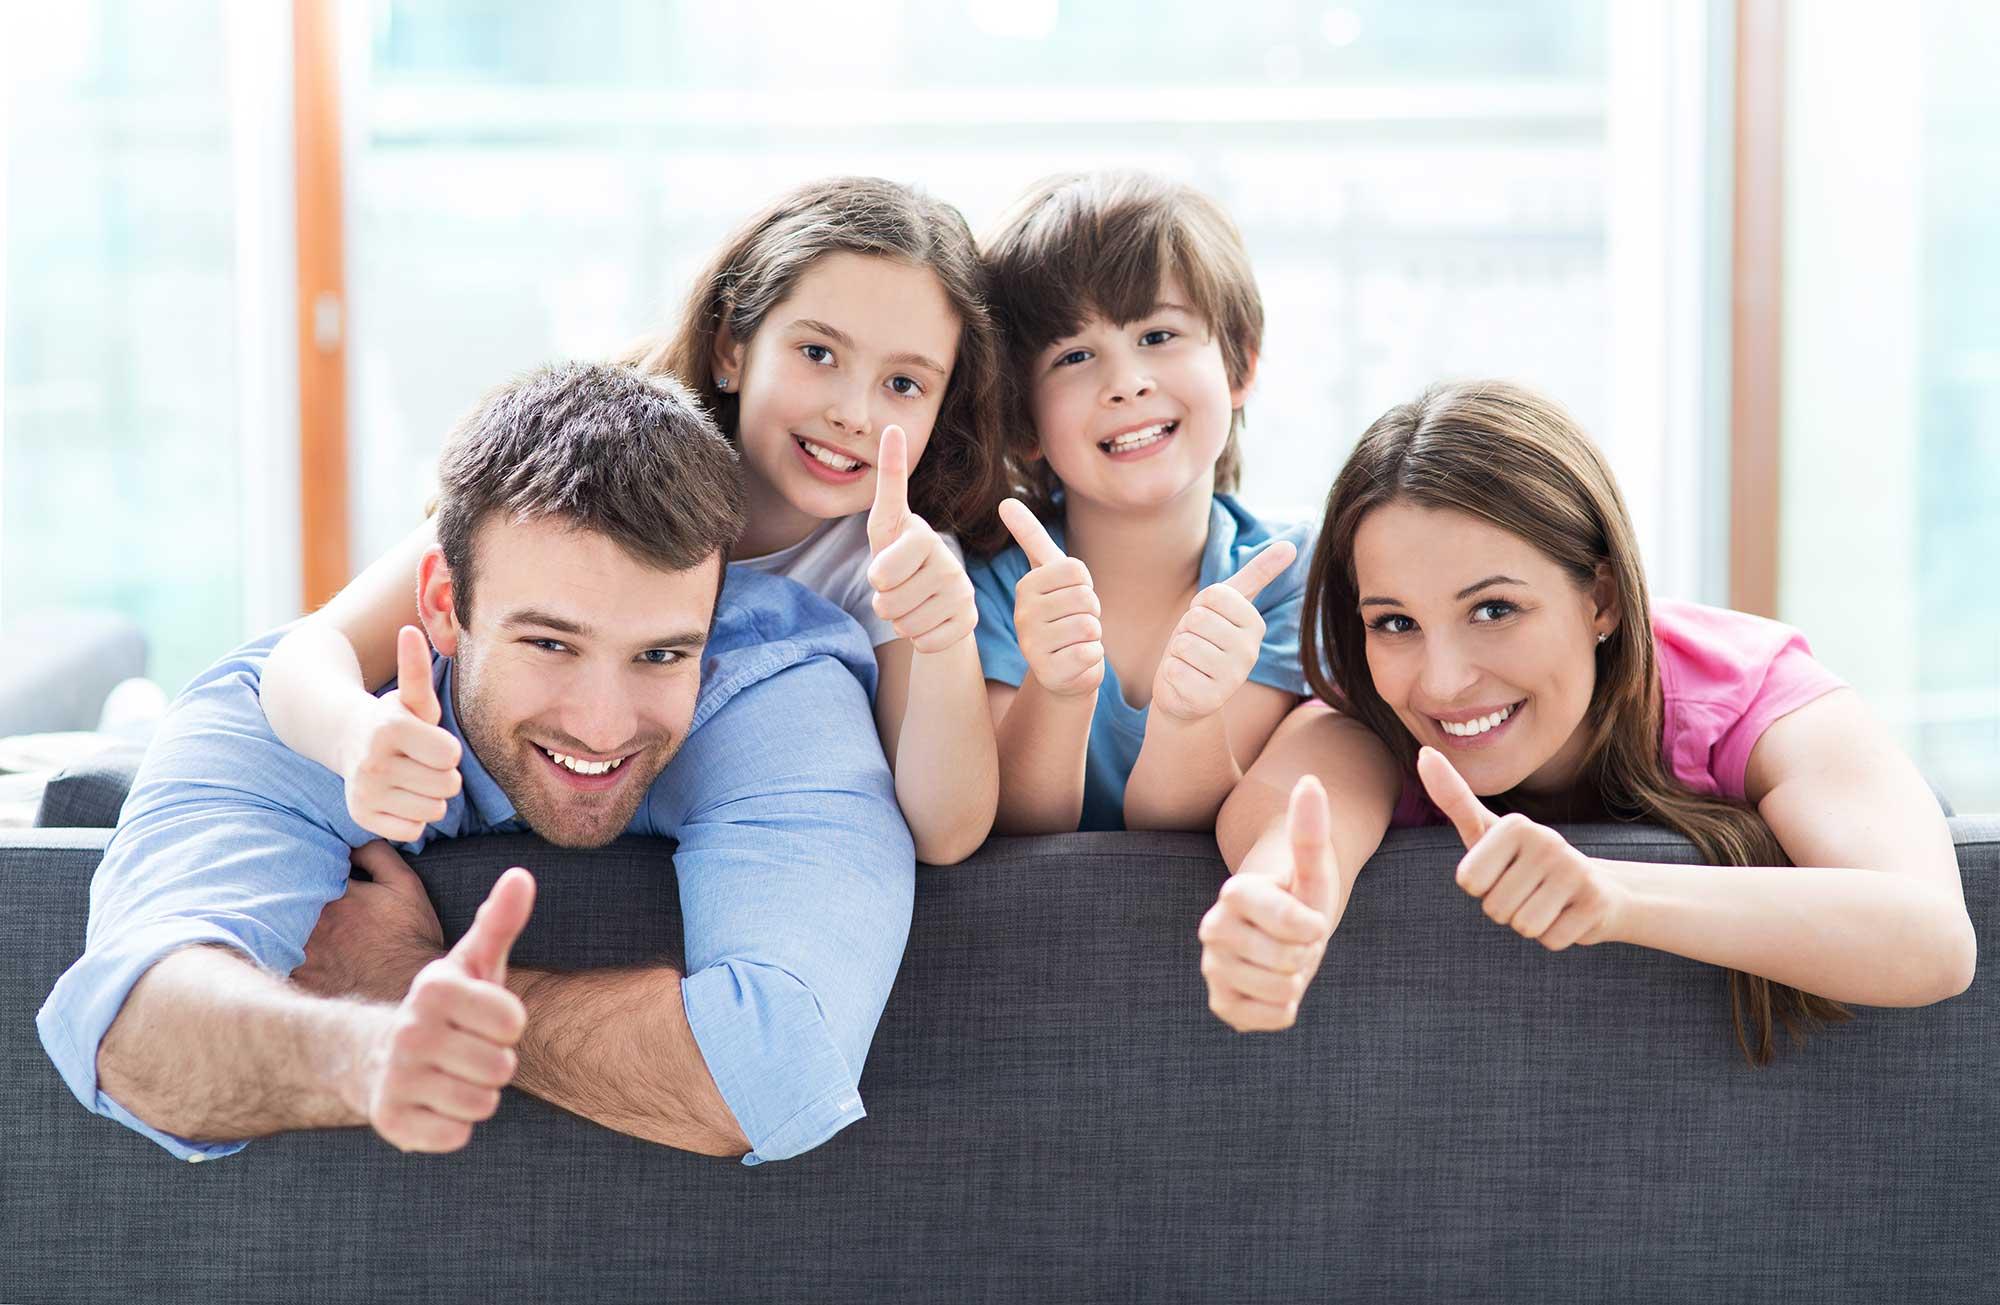 gatti-plumbing-residential-customer-reviews